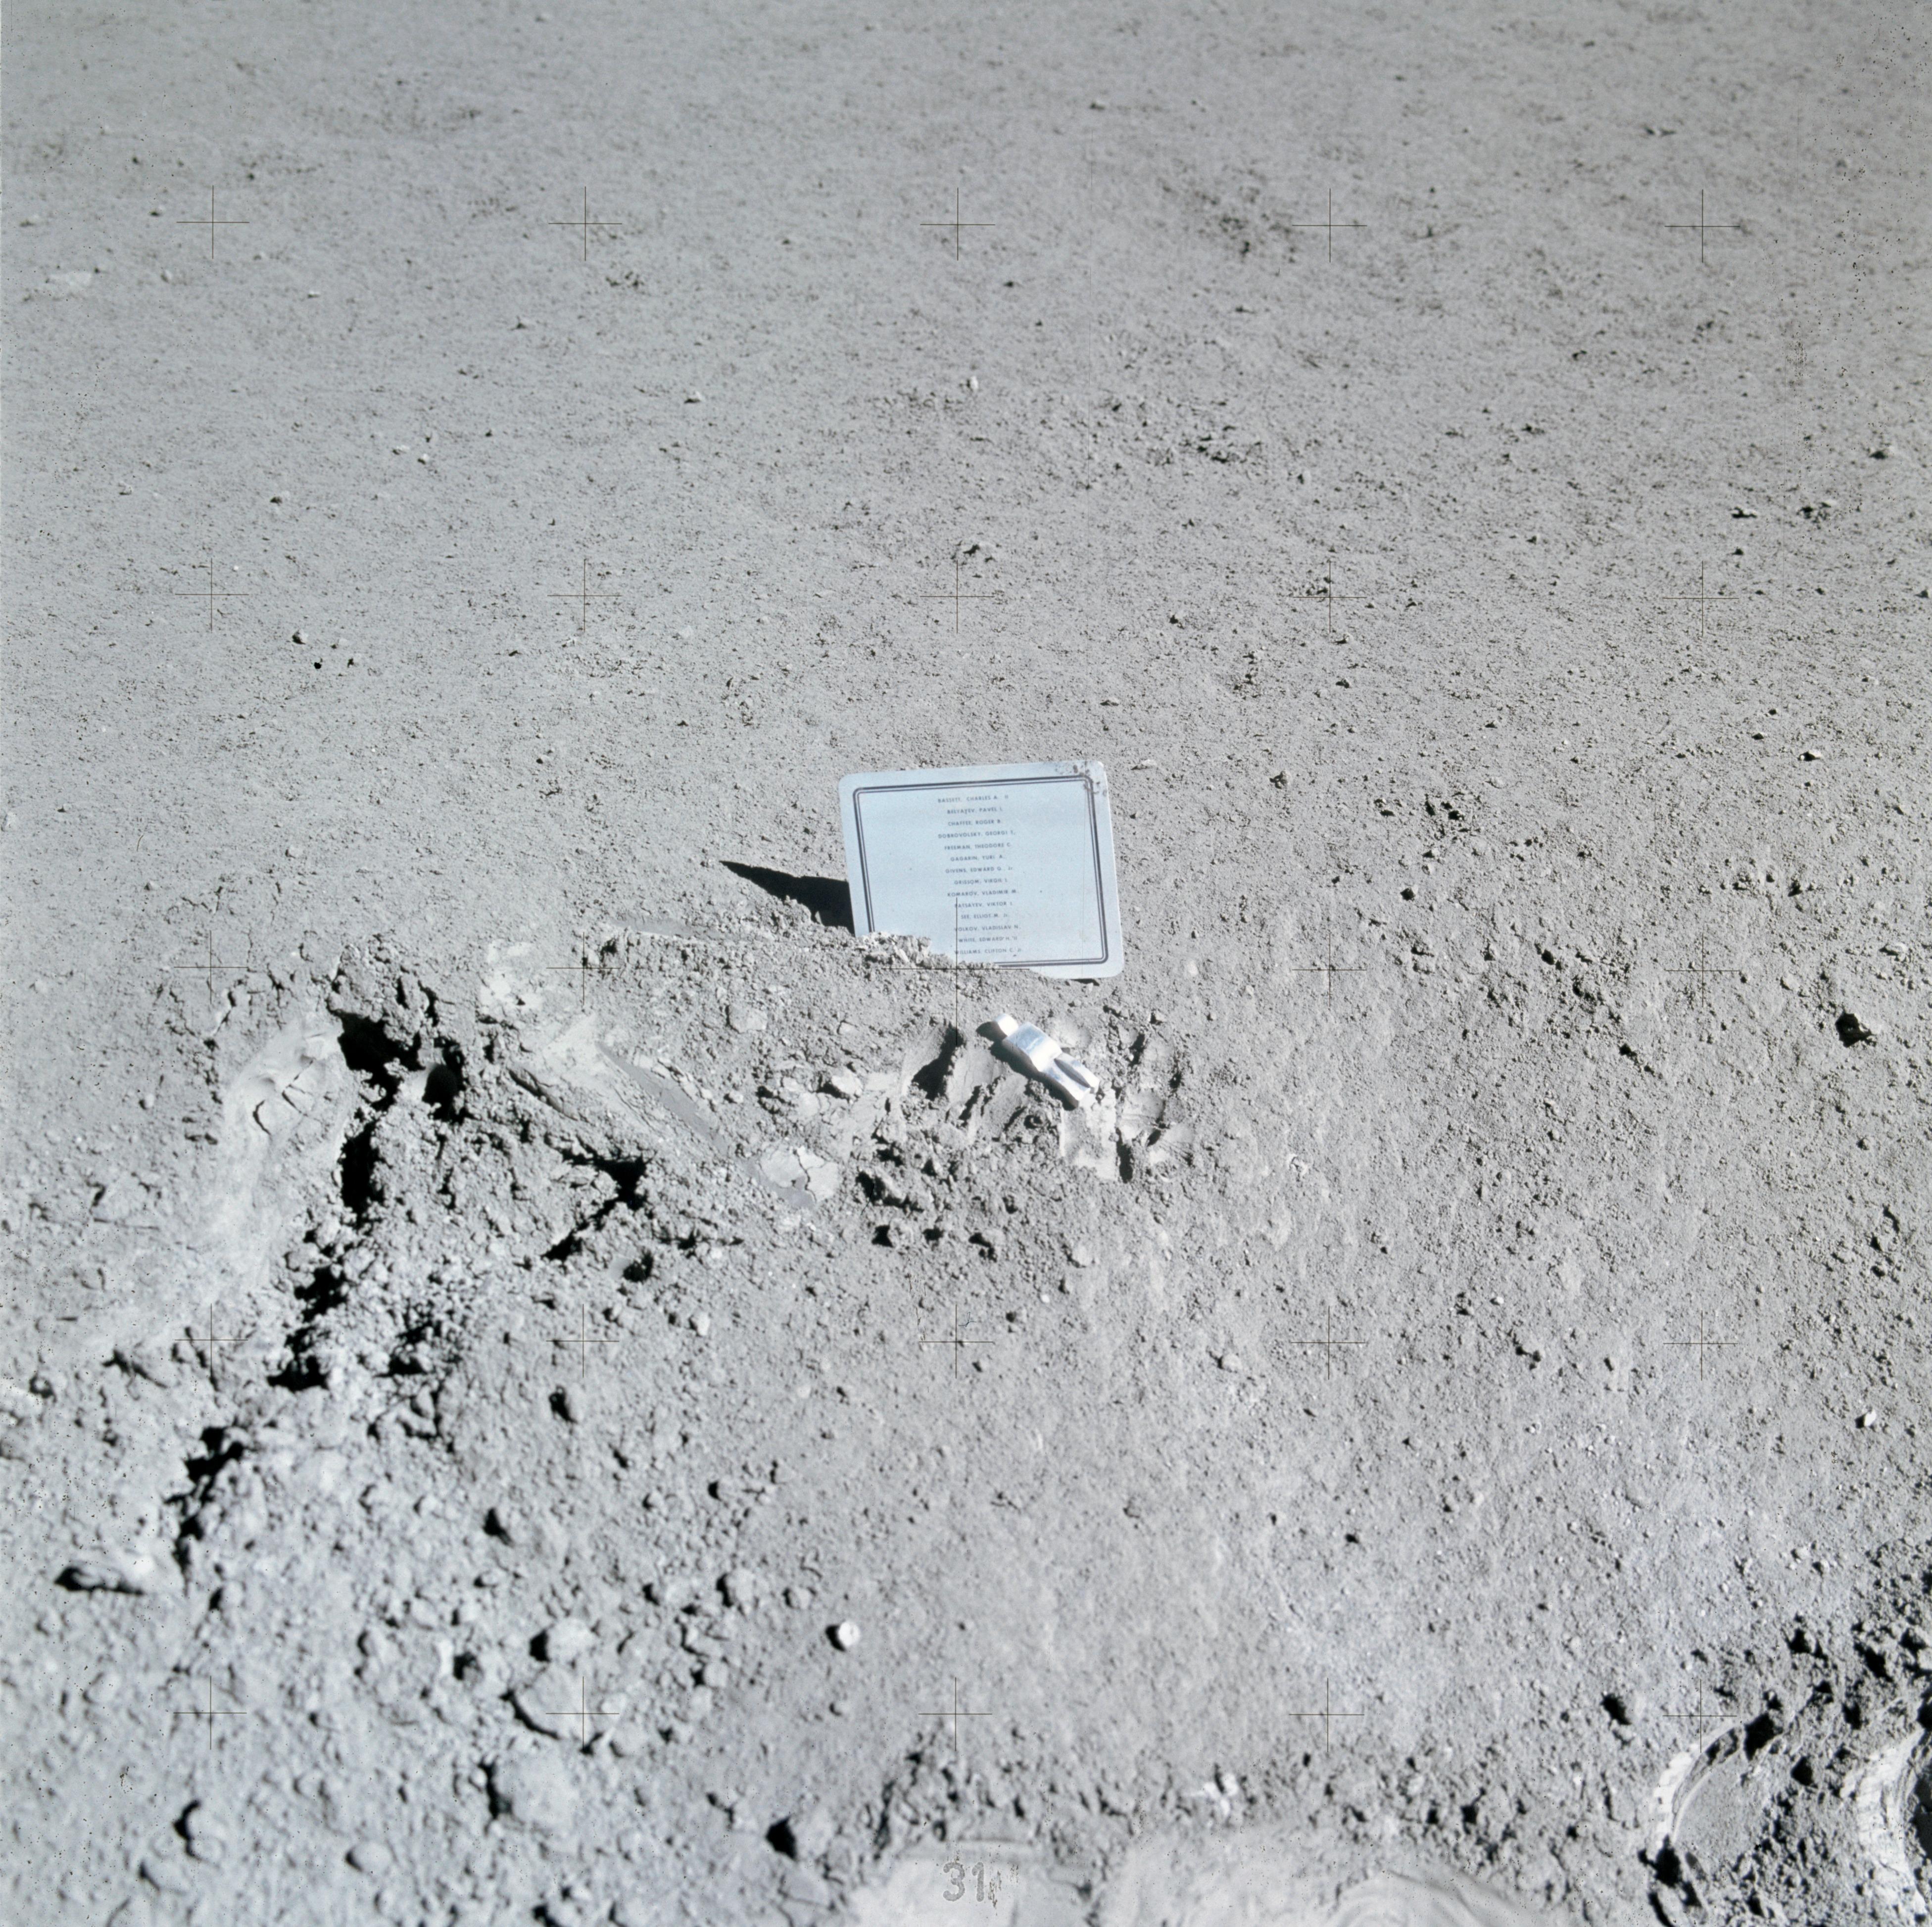 Paul Van Hoeydonck, Fallen Astronaut, 1971, image via Wikipedia via NASA